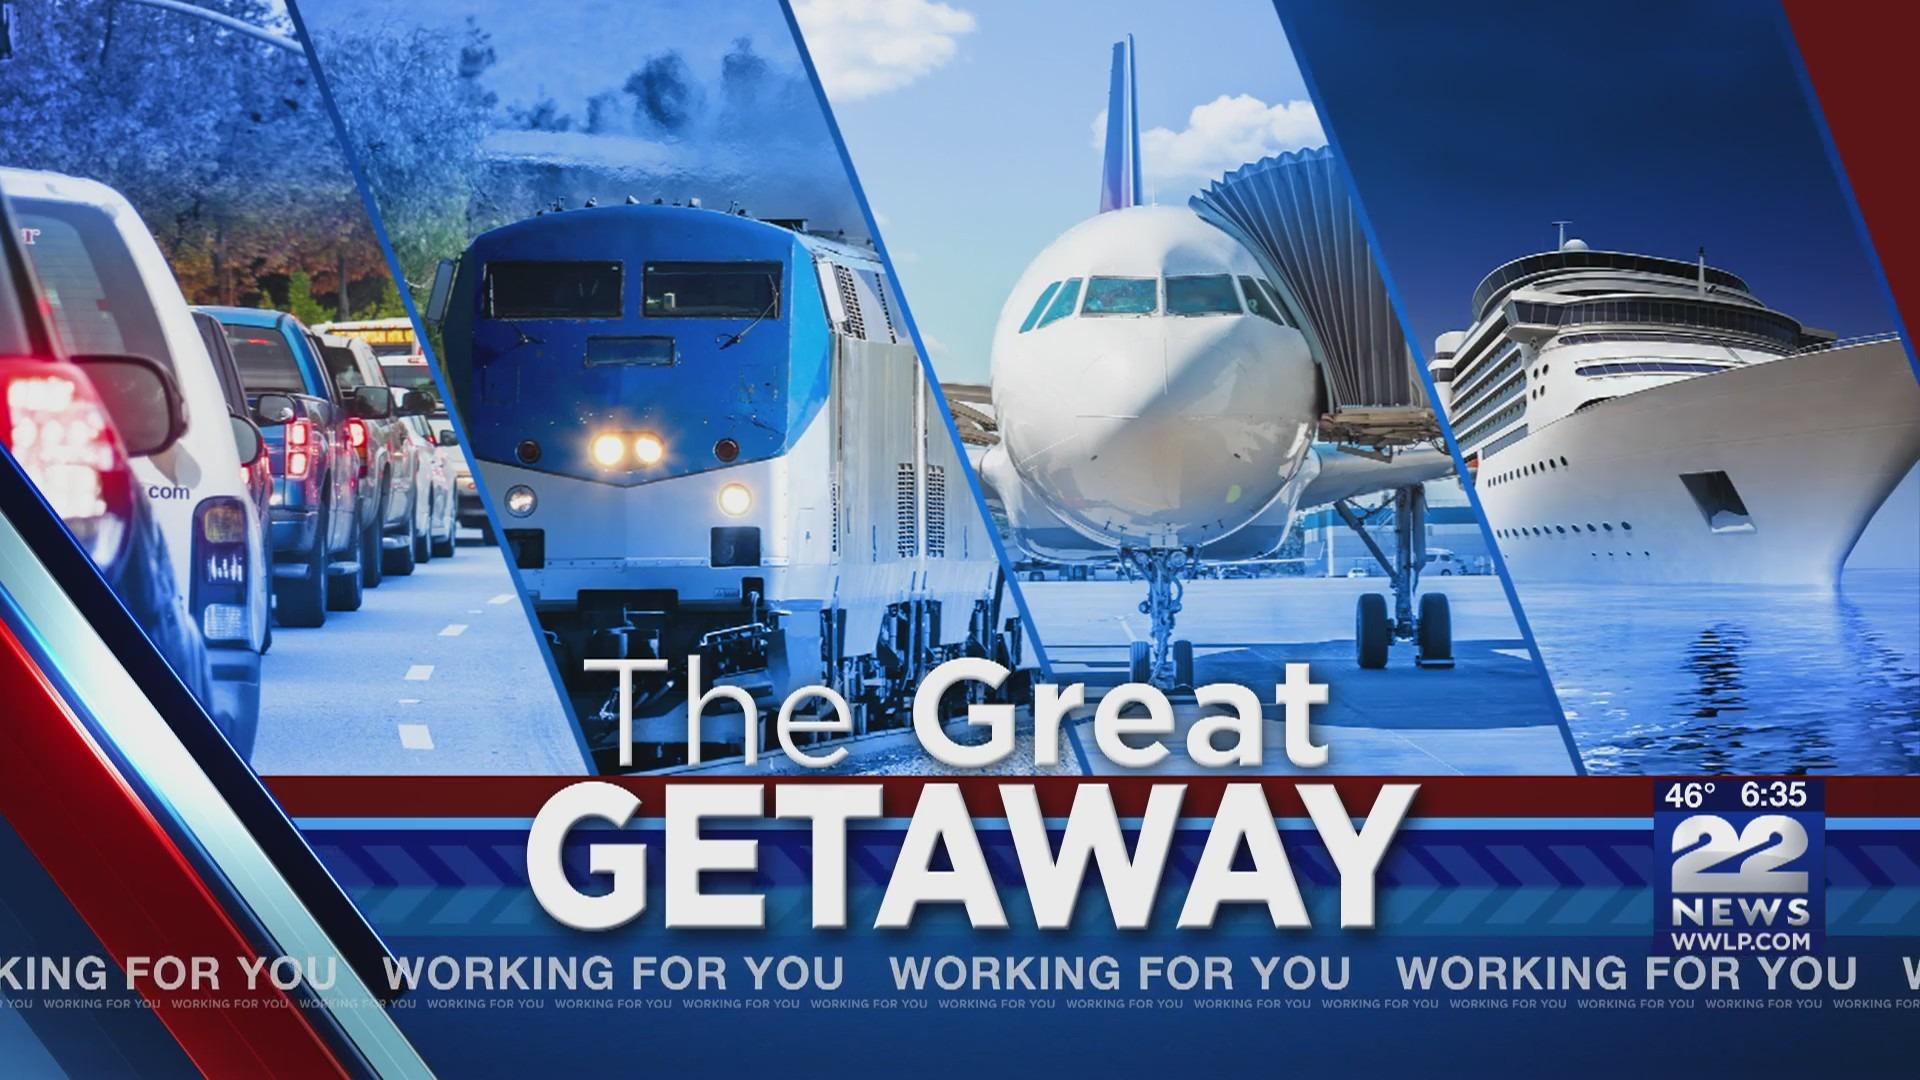 The Great Getaway